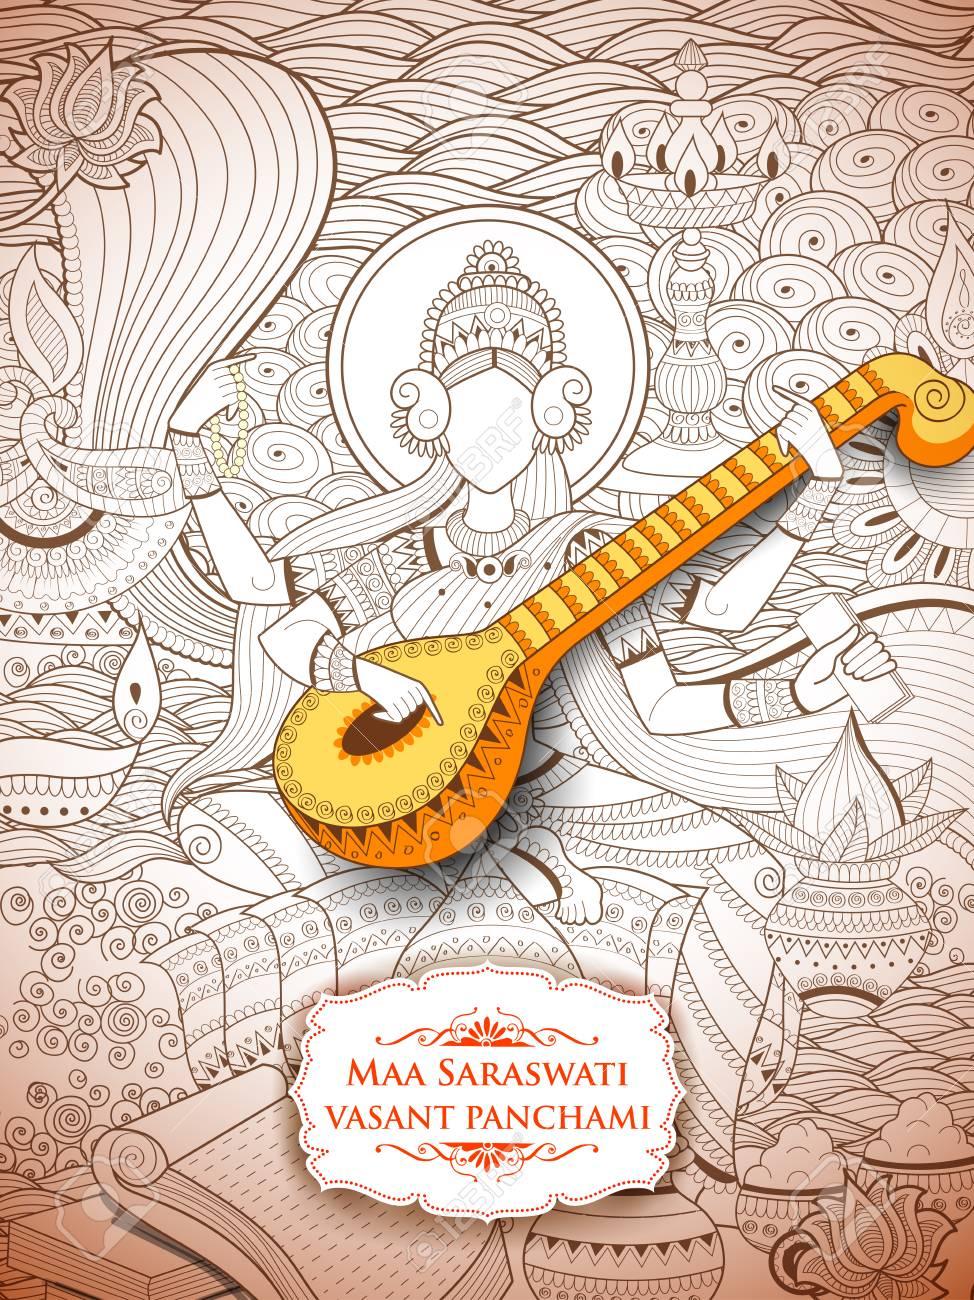 Goddess of Wisdom Saraswati for Vasant Panchami India festival background - 93450838